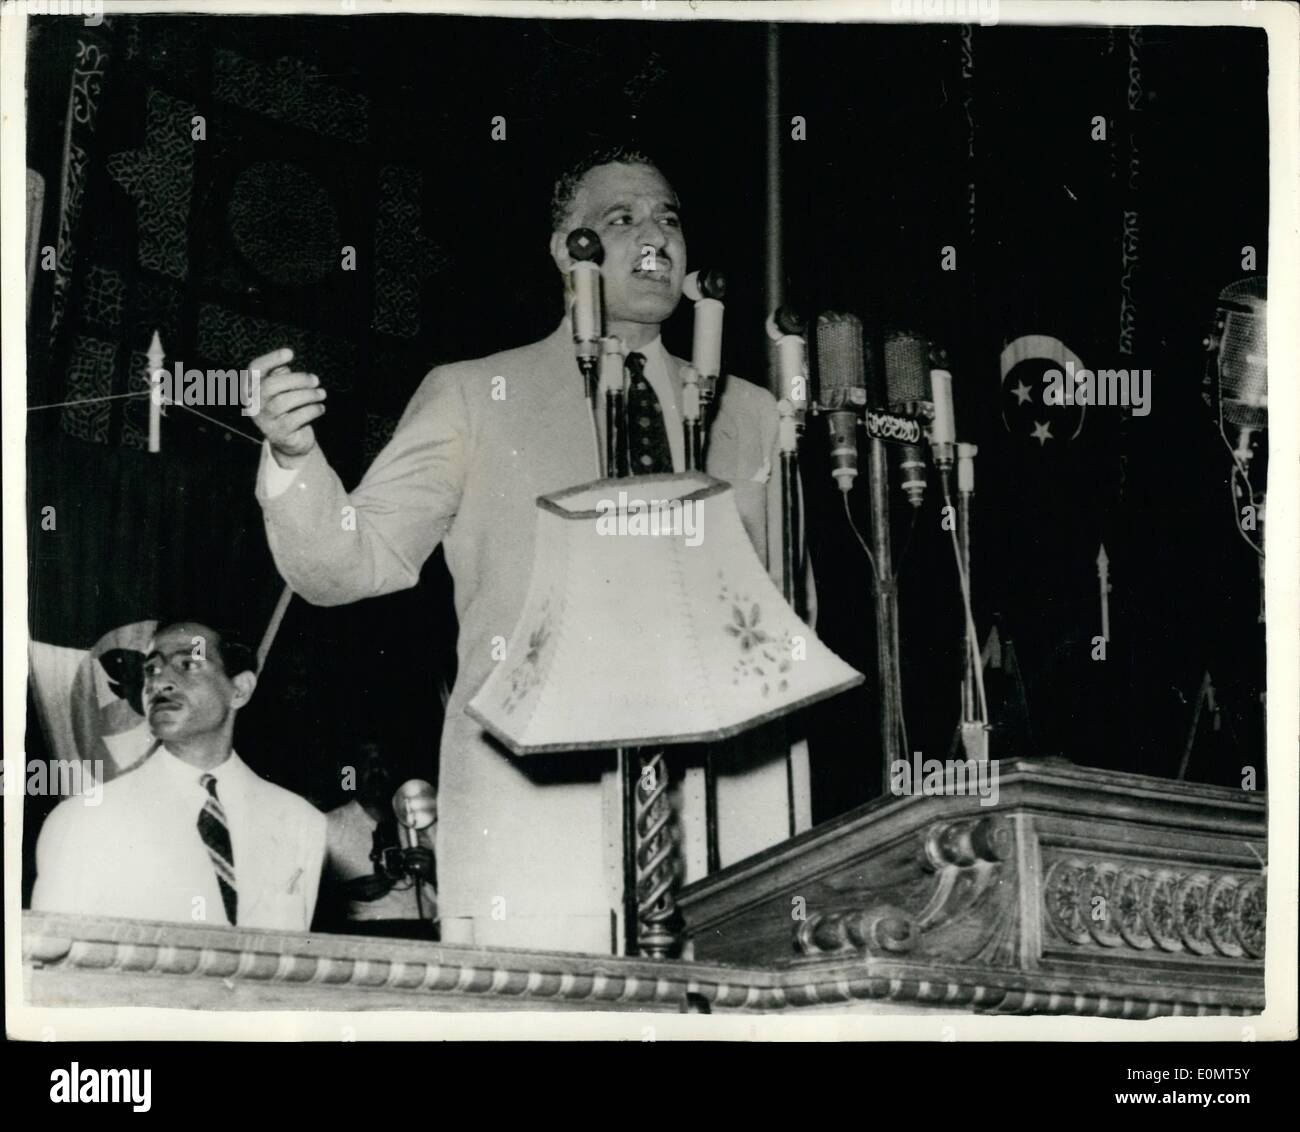 Jun. 06, 1956 - Prime Minister Gamal Nasser terminates Martial Law throughout Egypt: Prime Minister Gamal Nasser - Stock Image